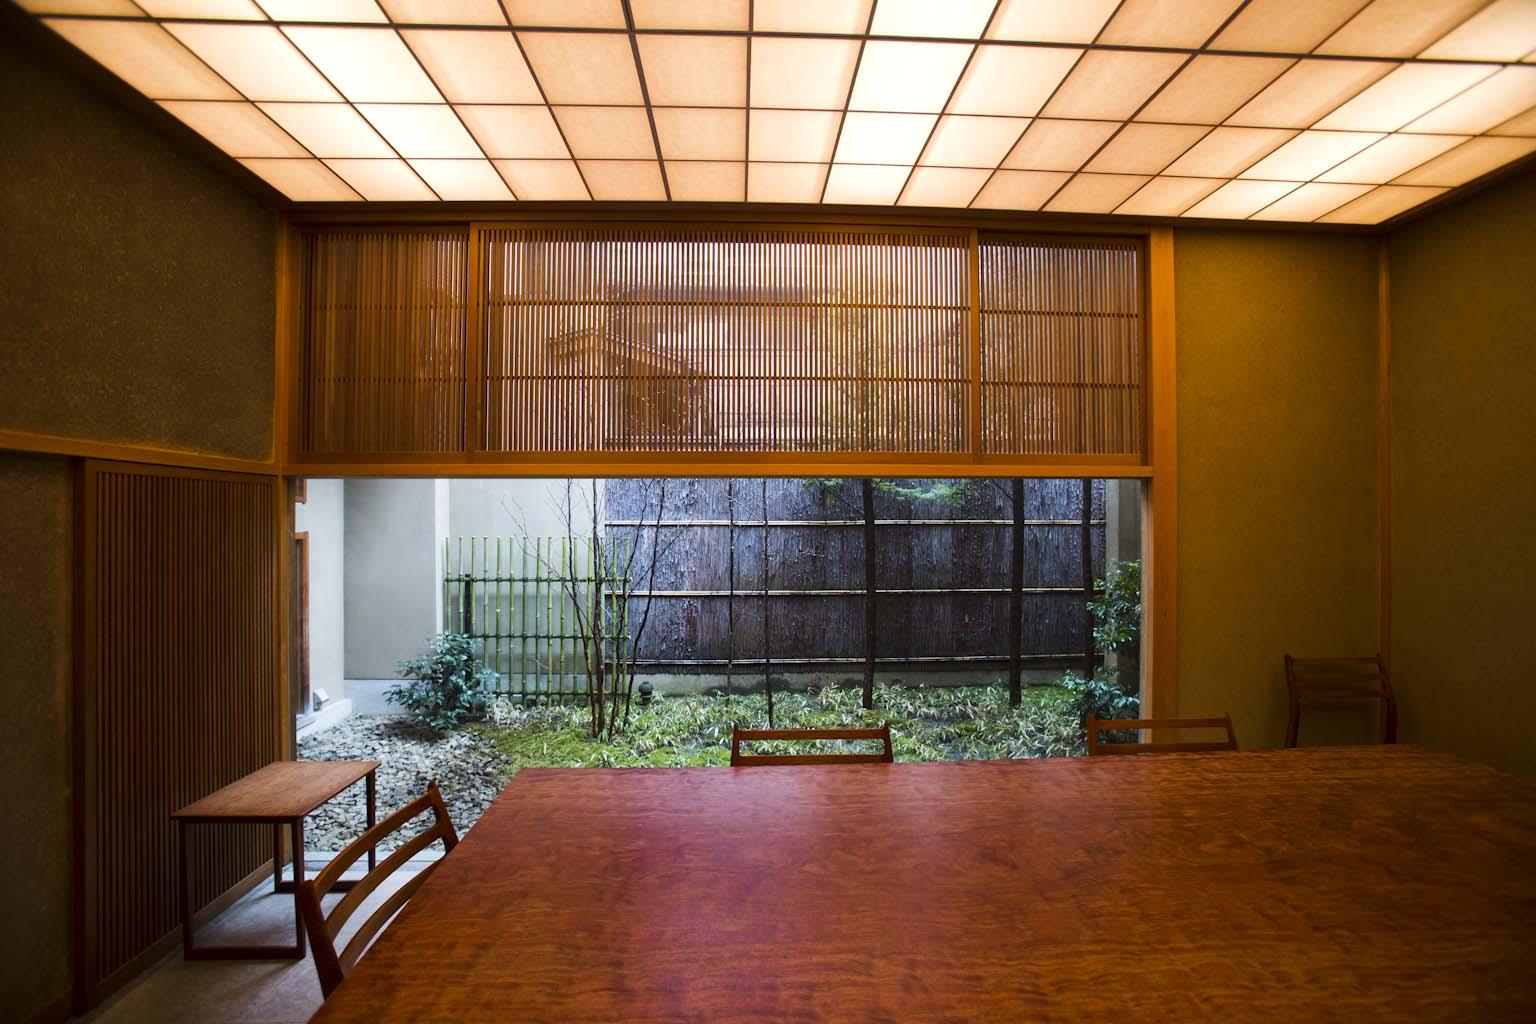 Ogata gallery #0